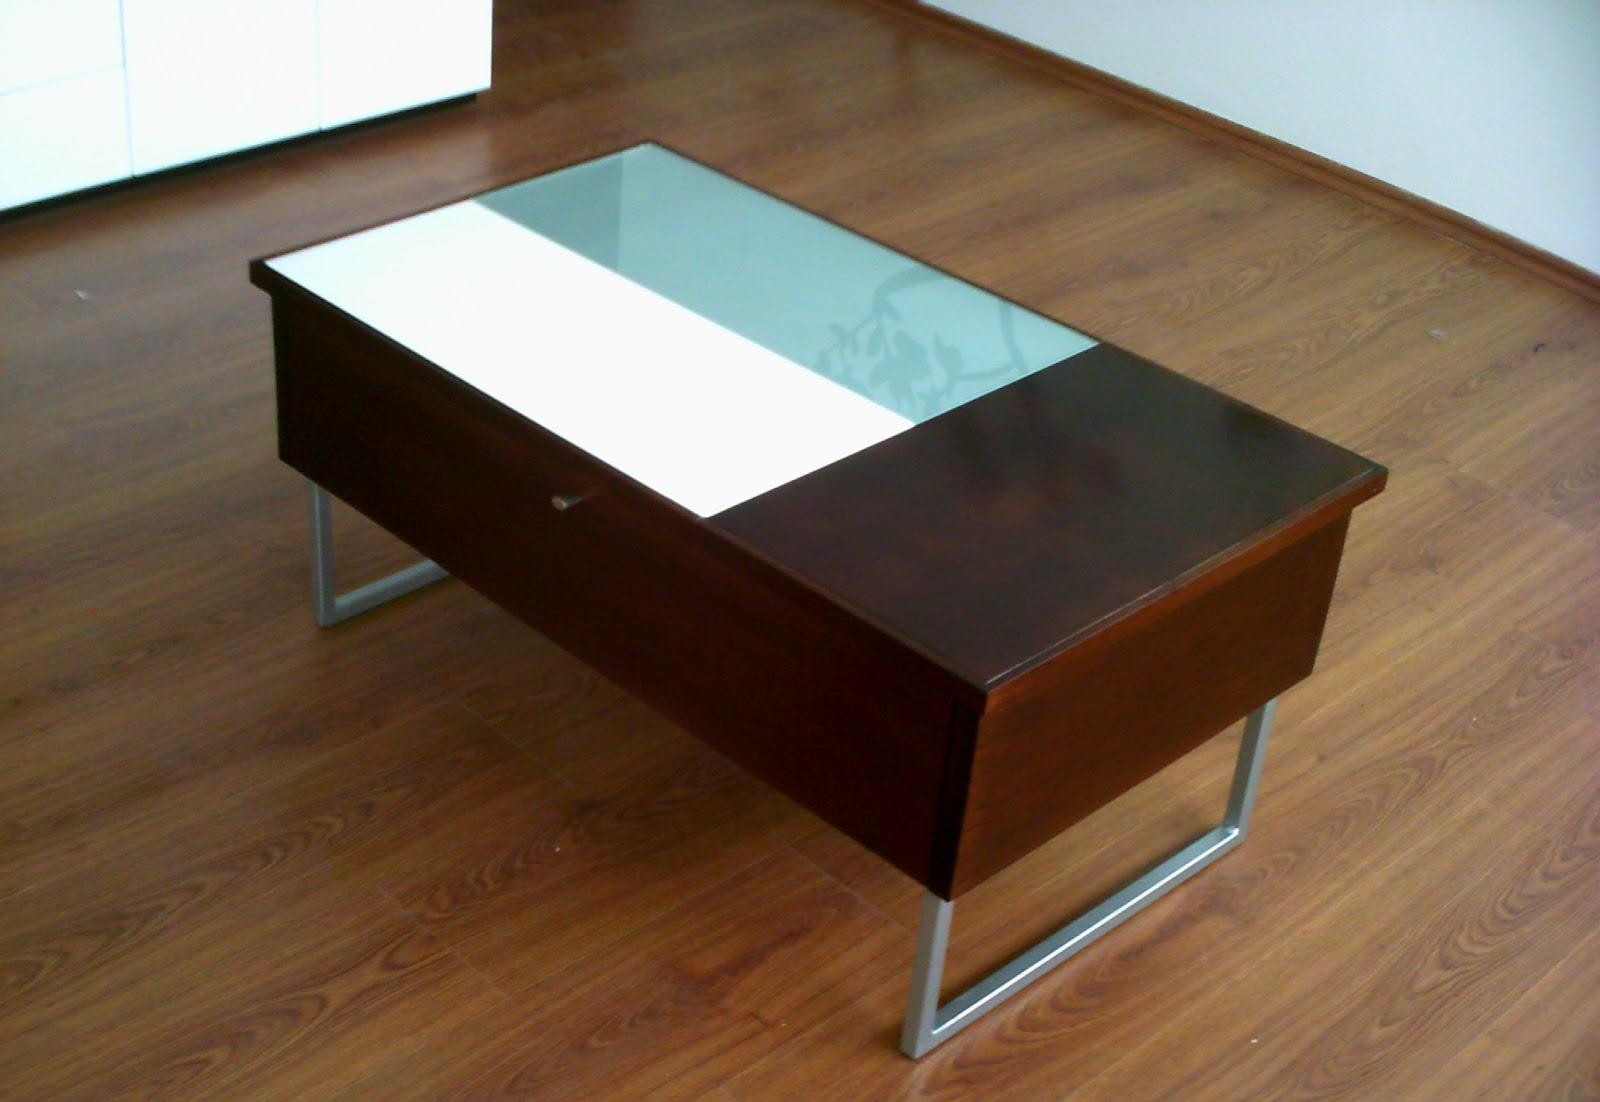 Dise o de mesa de centro minimalista fabricada en mdf for Casa minimalista cristal